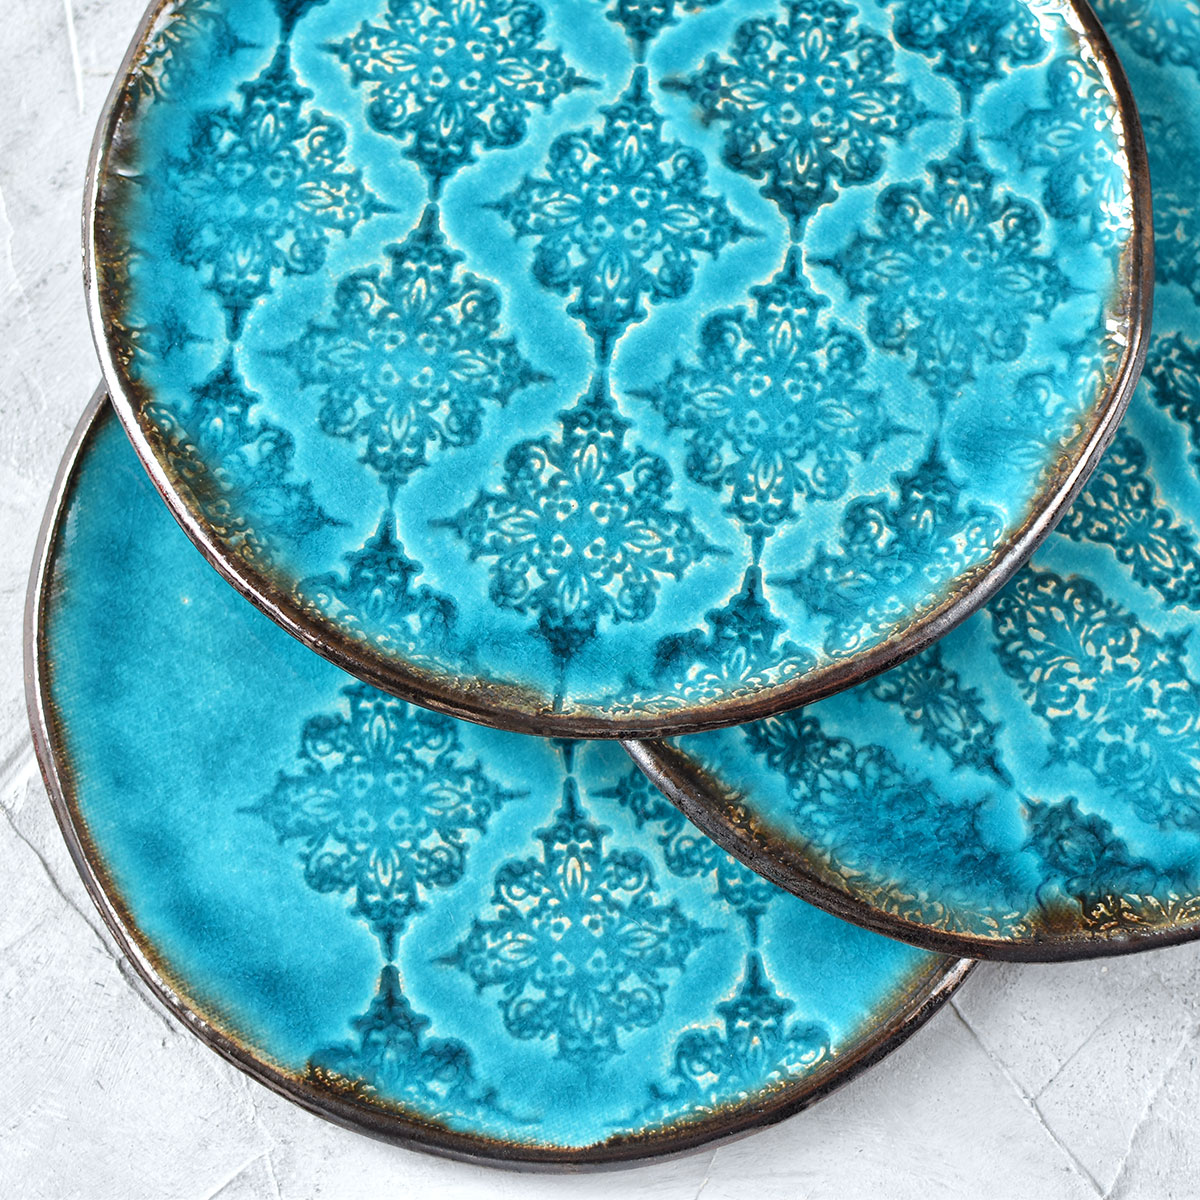 картинка Бирюзовая тарелка с узорами 2 - DishWishes.Ru